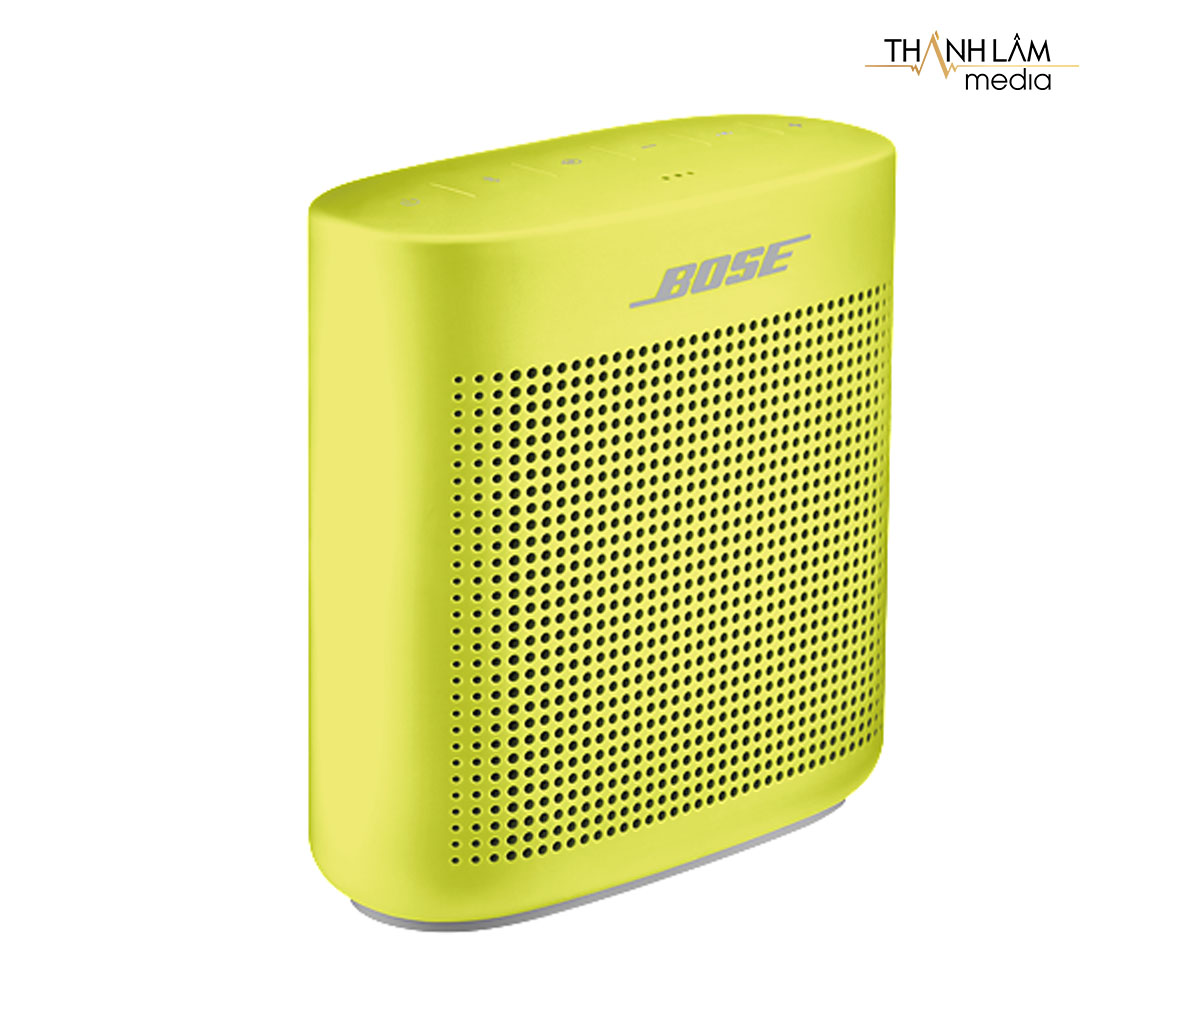 Loa-Bose-SoundLink-Color-2-Vang-3